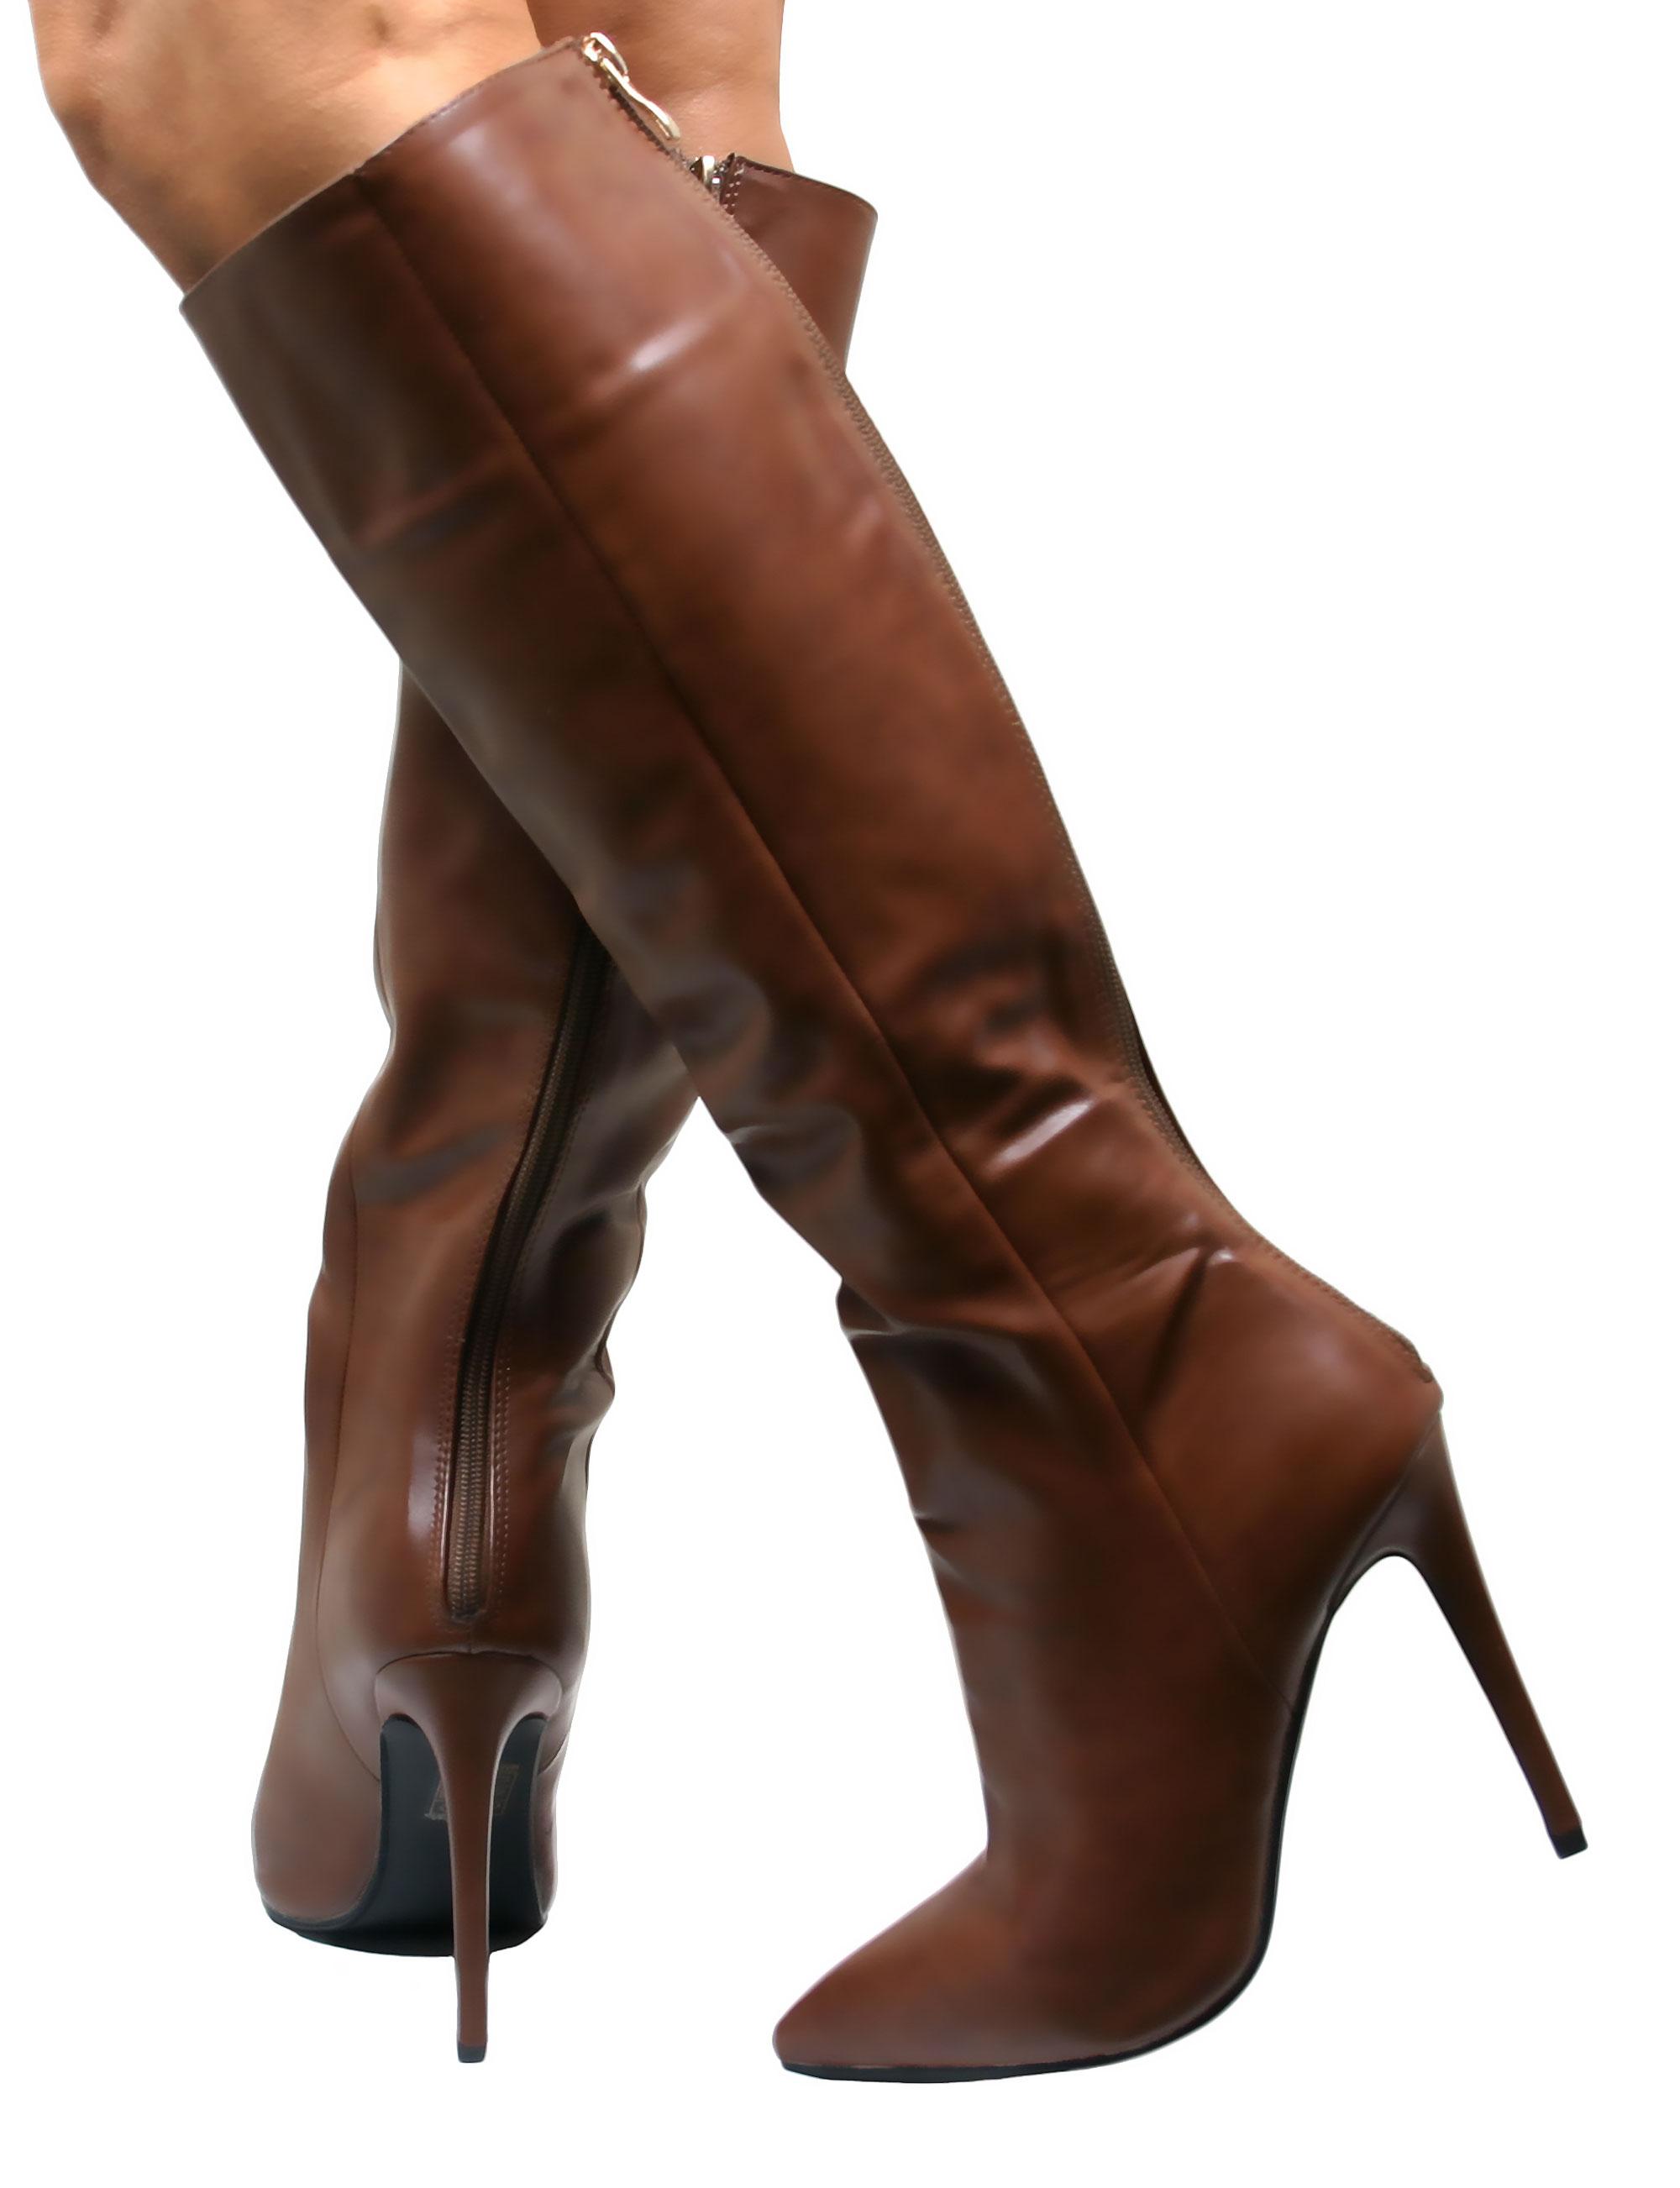 Comfy High Heel Shoes